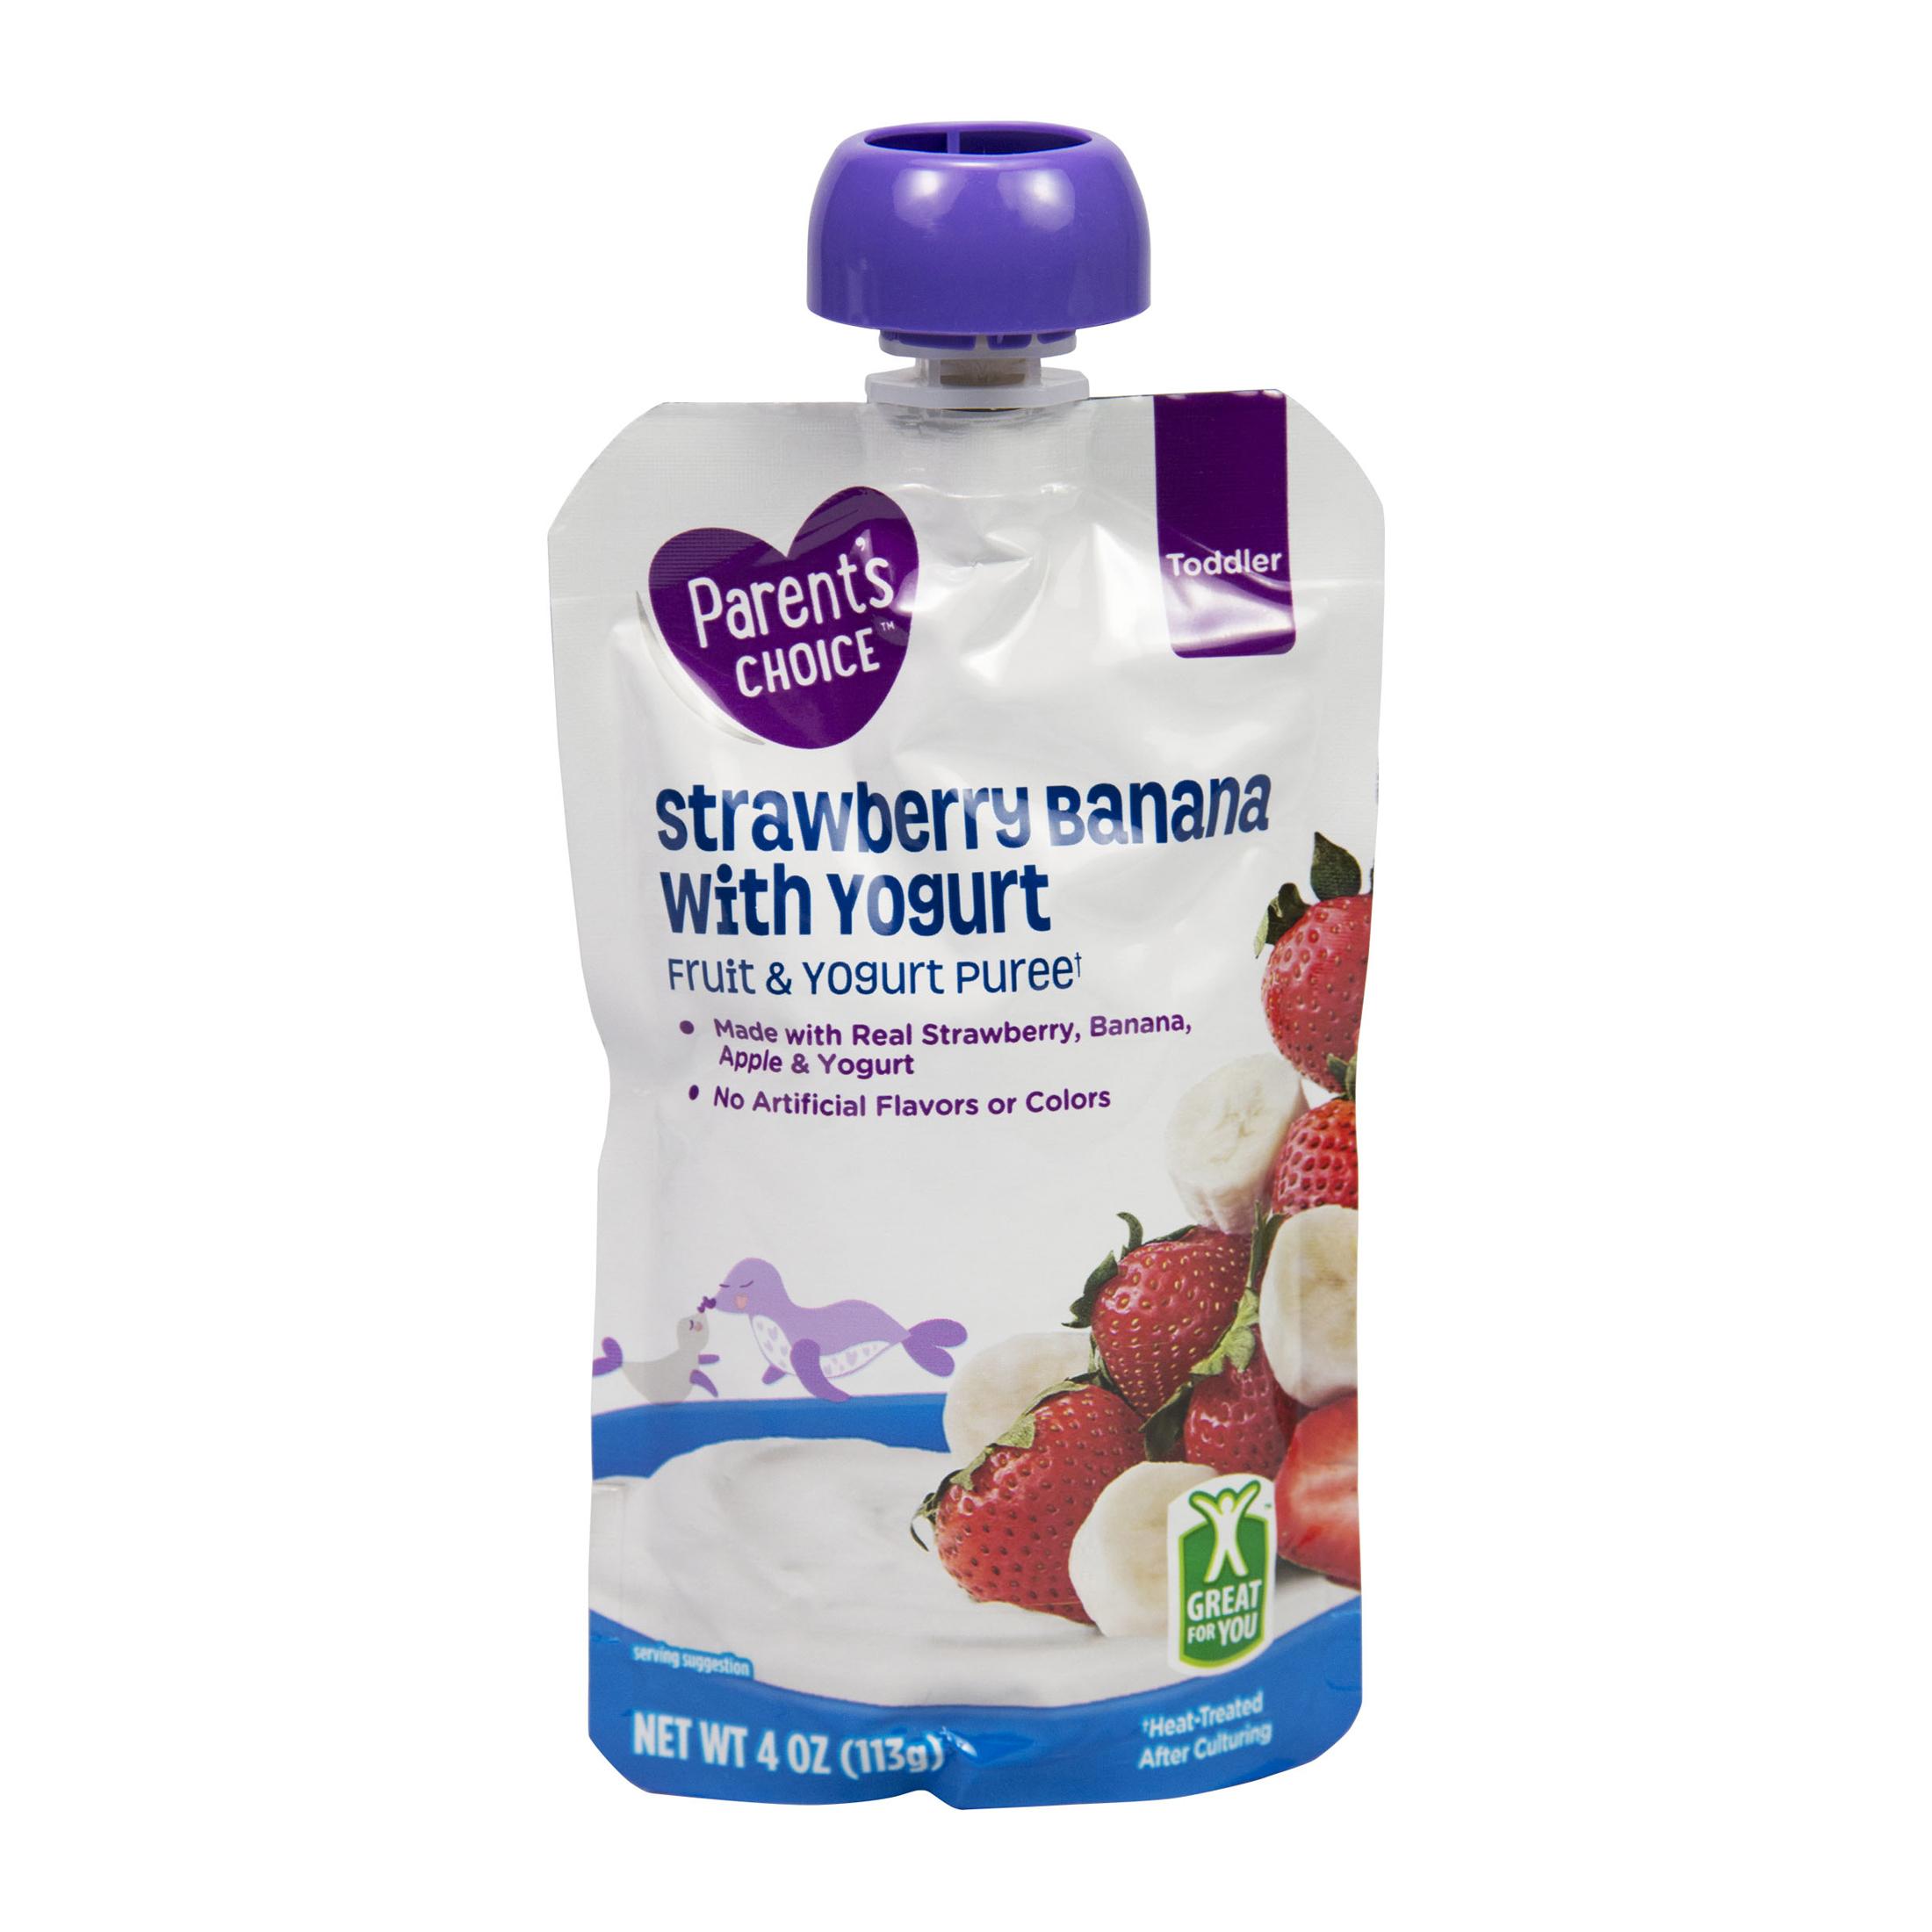 Parent's Choice Strawberry Banana & Yogurt, Stage 4, 4 oz Pouch